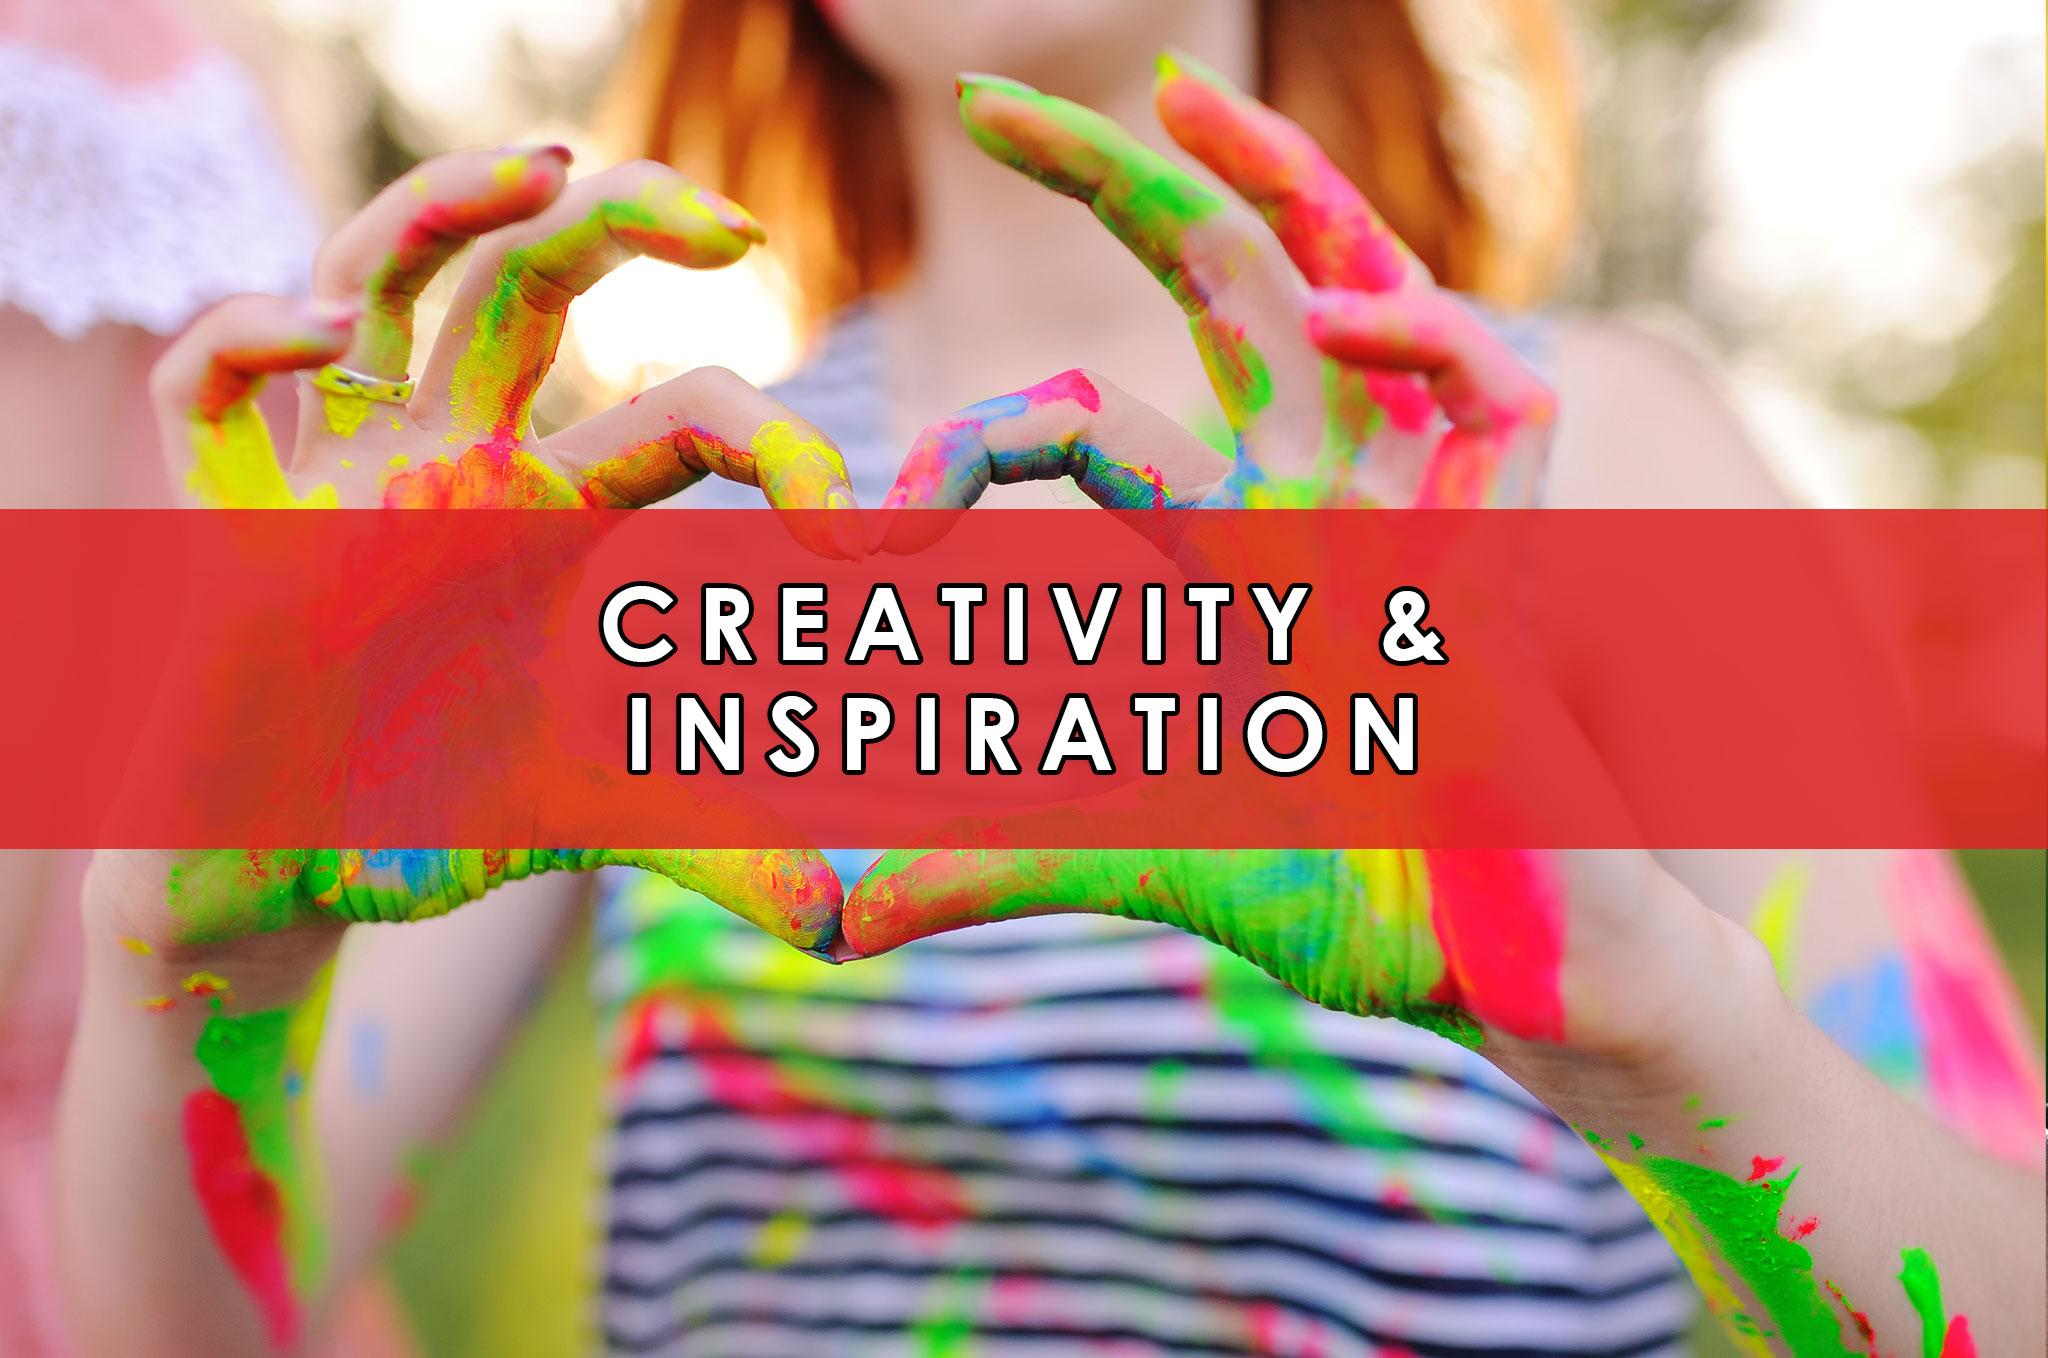 Creativity & Inspiration | HeartFirst Education Core Value